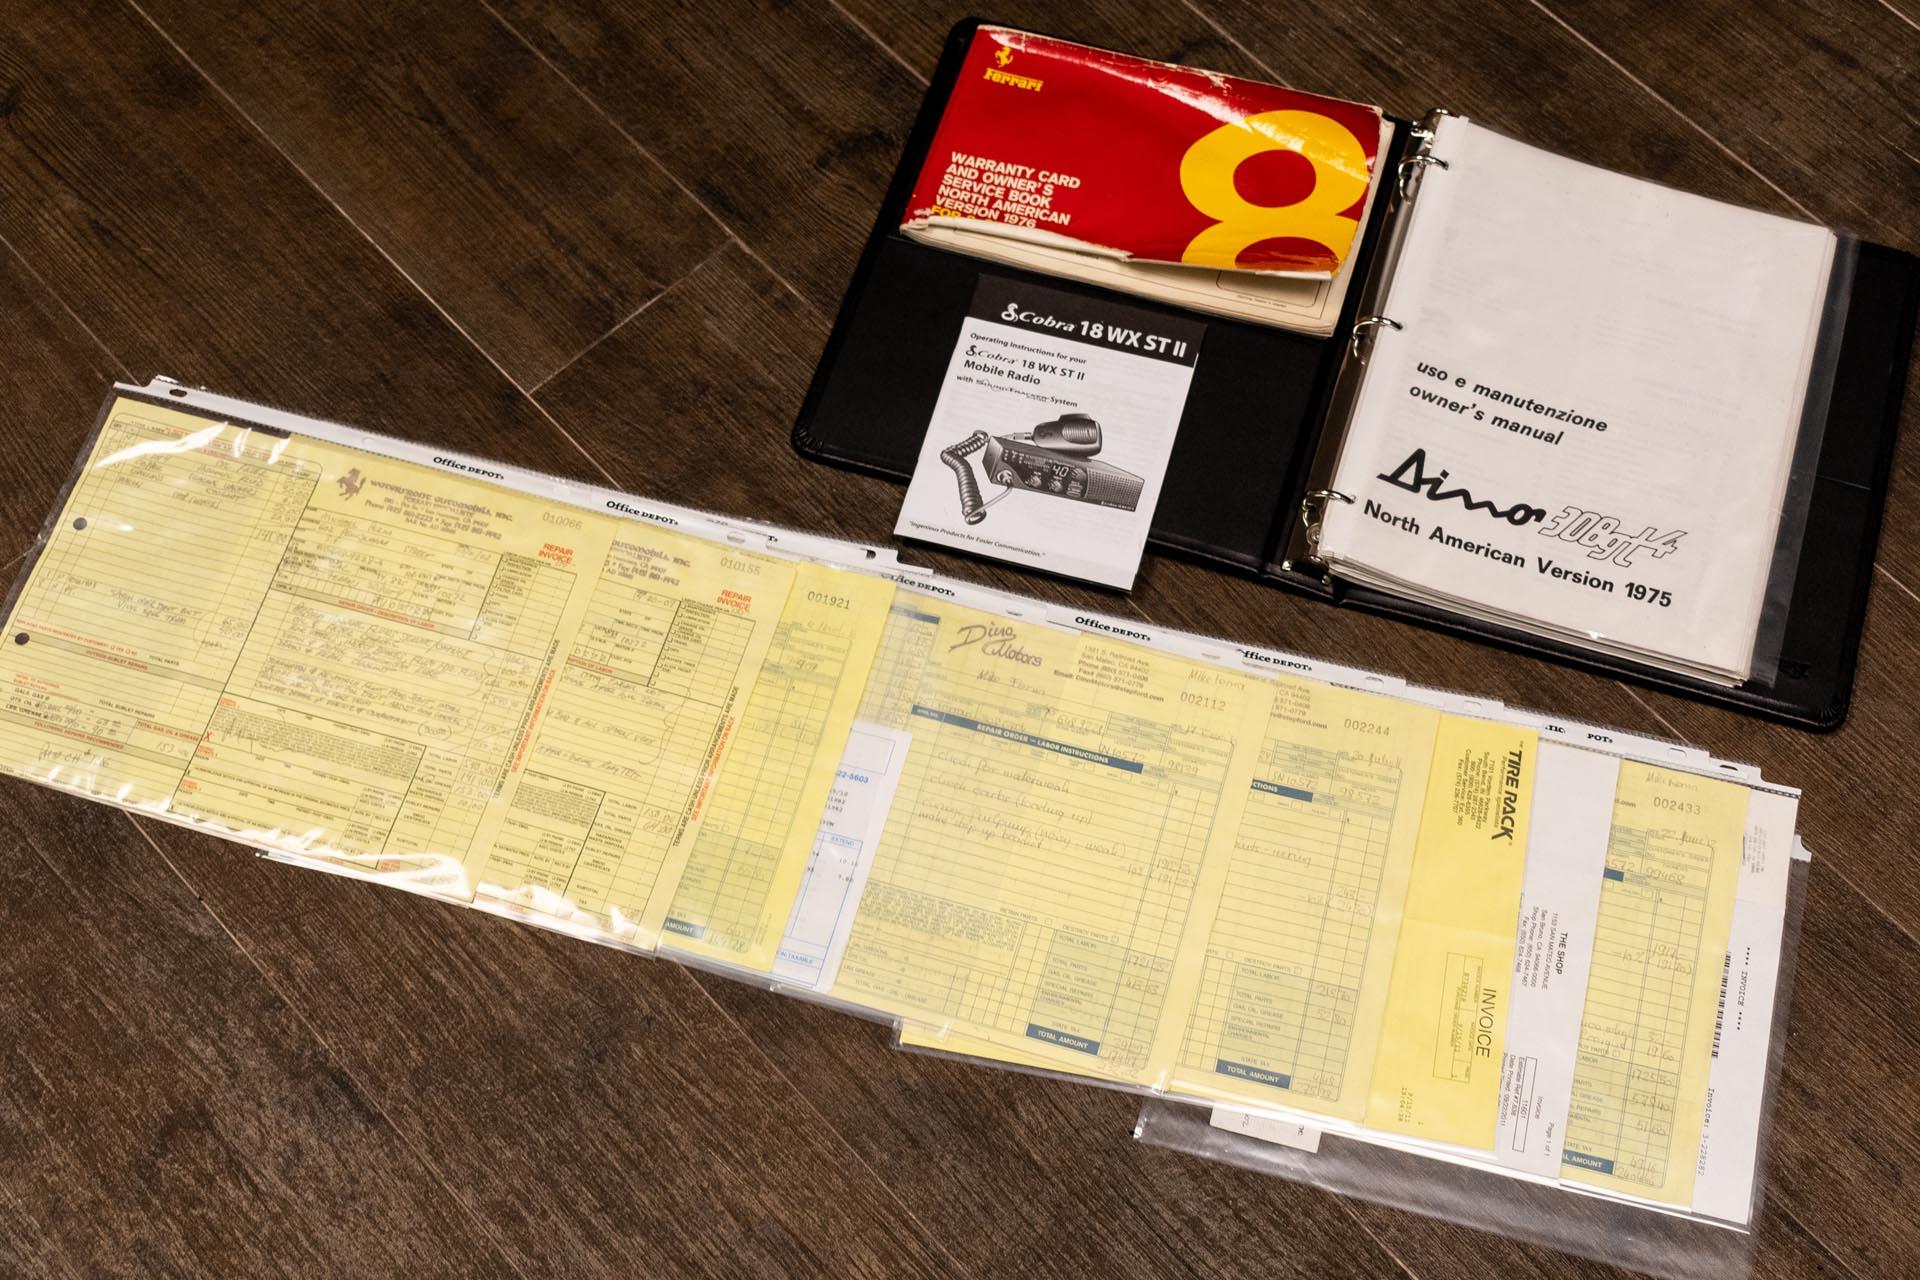 Ferrari-308-Dino-GT4-Safari-1975-23